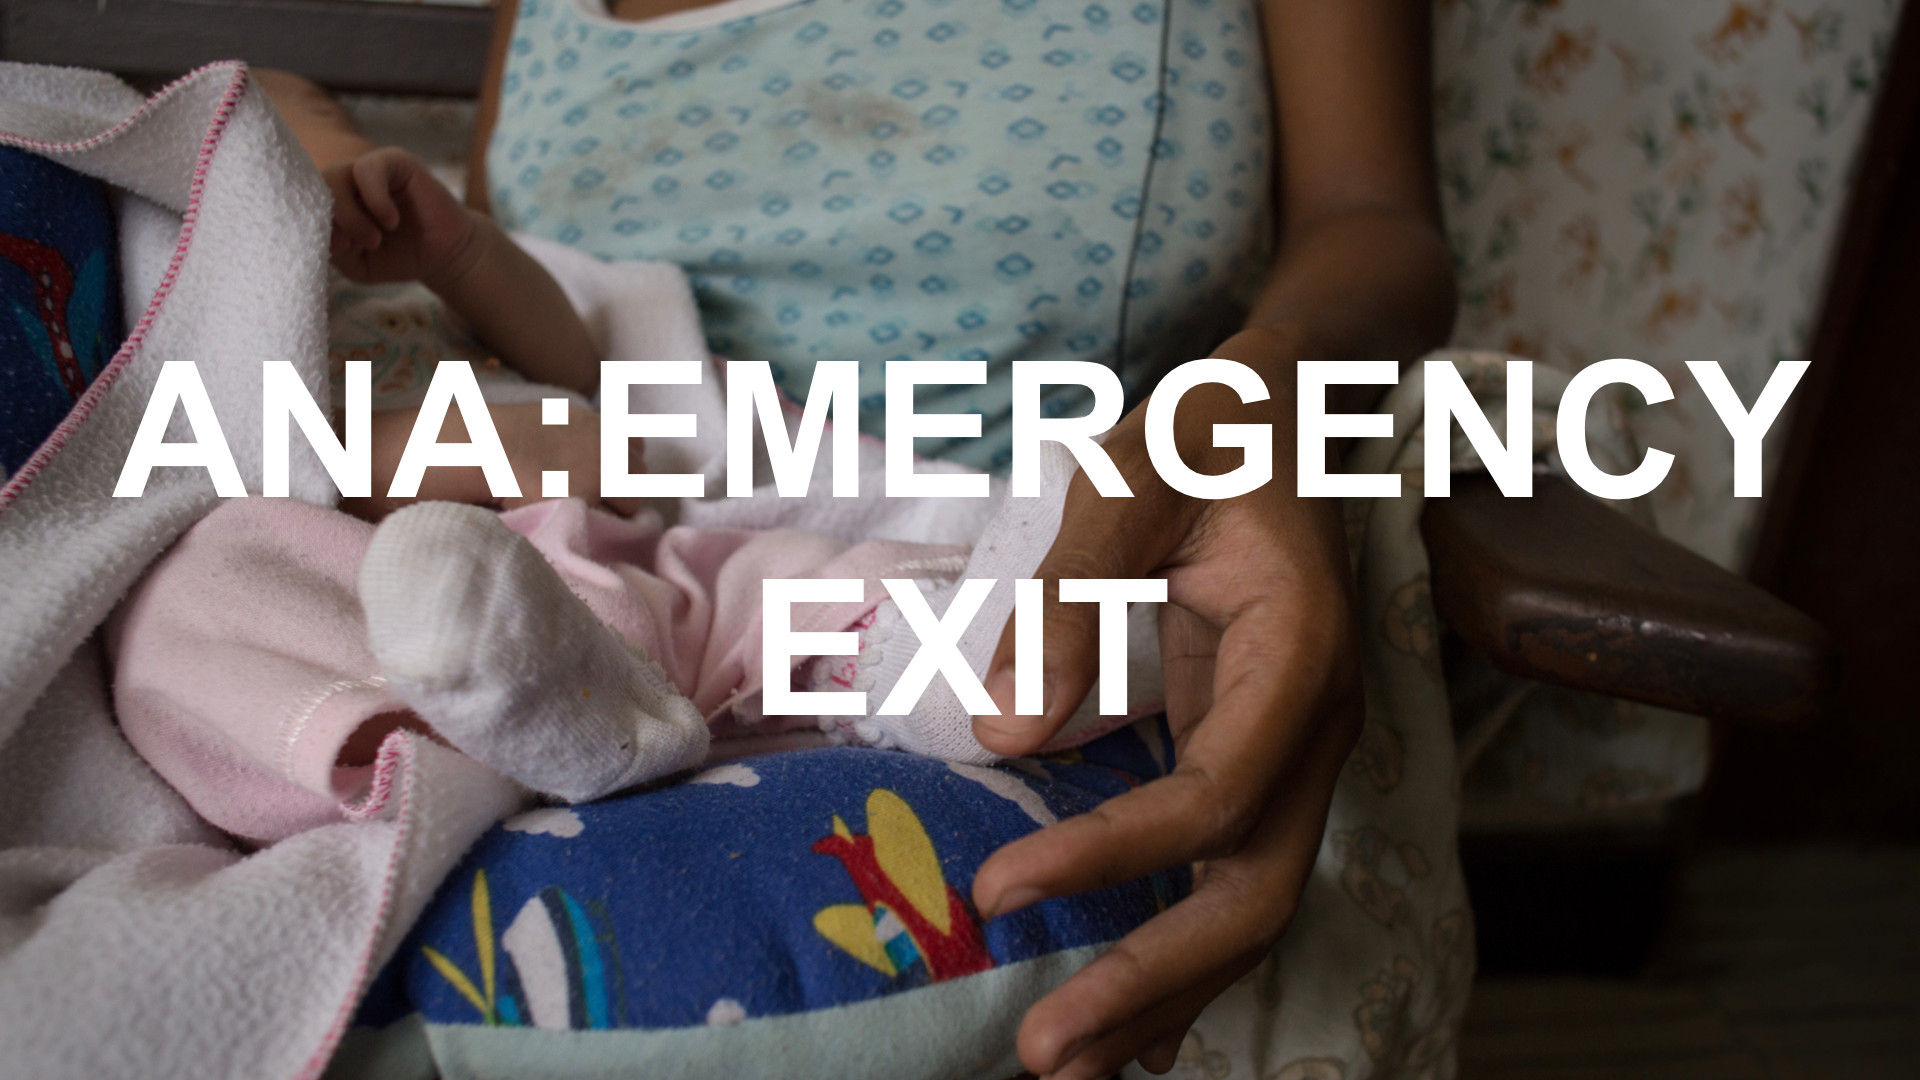 ANA-EMERGENCY EXIT